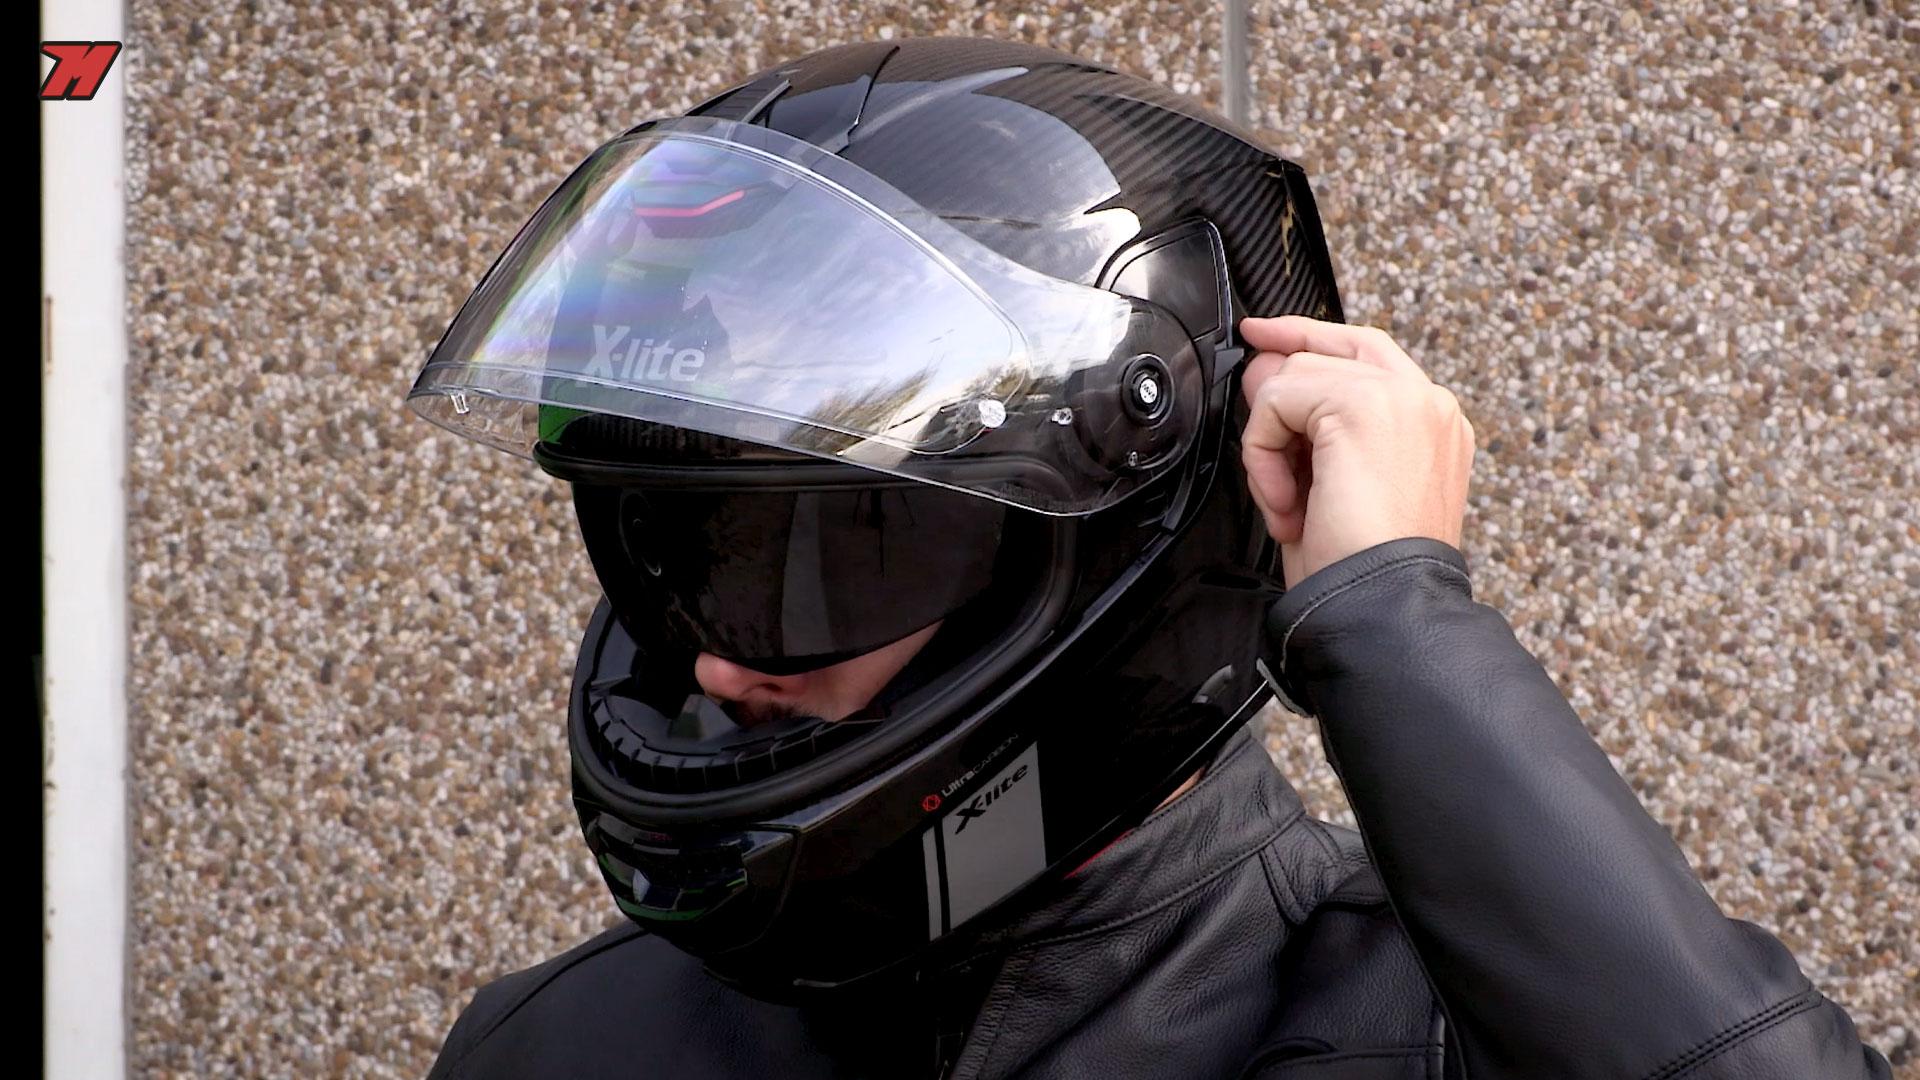 x lite x 903 ultra carbon el nuevo casco integral de alta gama de nolan motocard. Black Bedroom Furniture Sets. Home Design Ideas